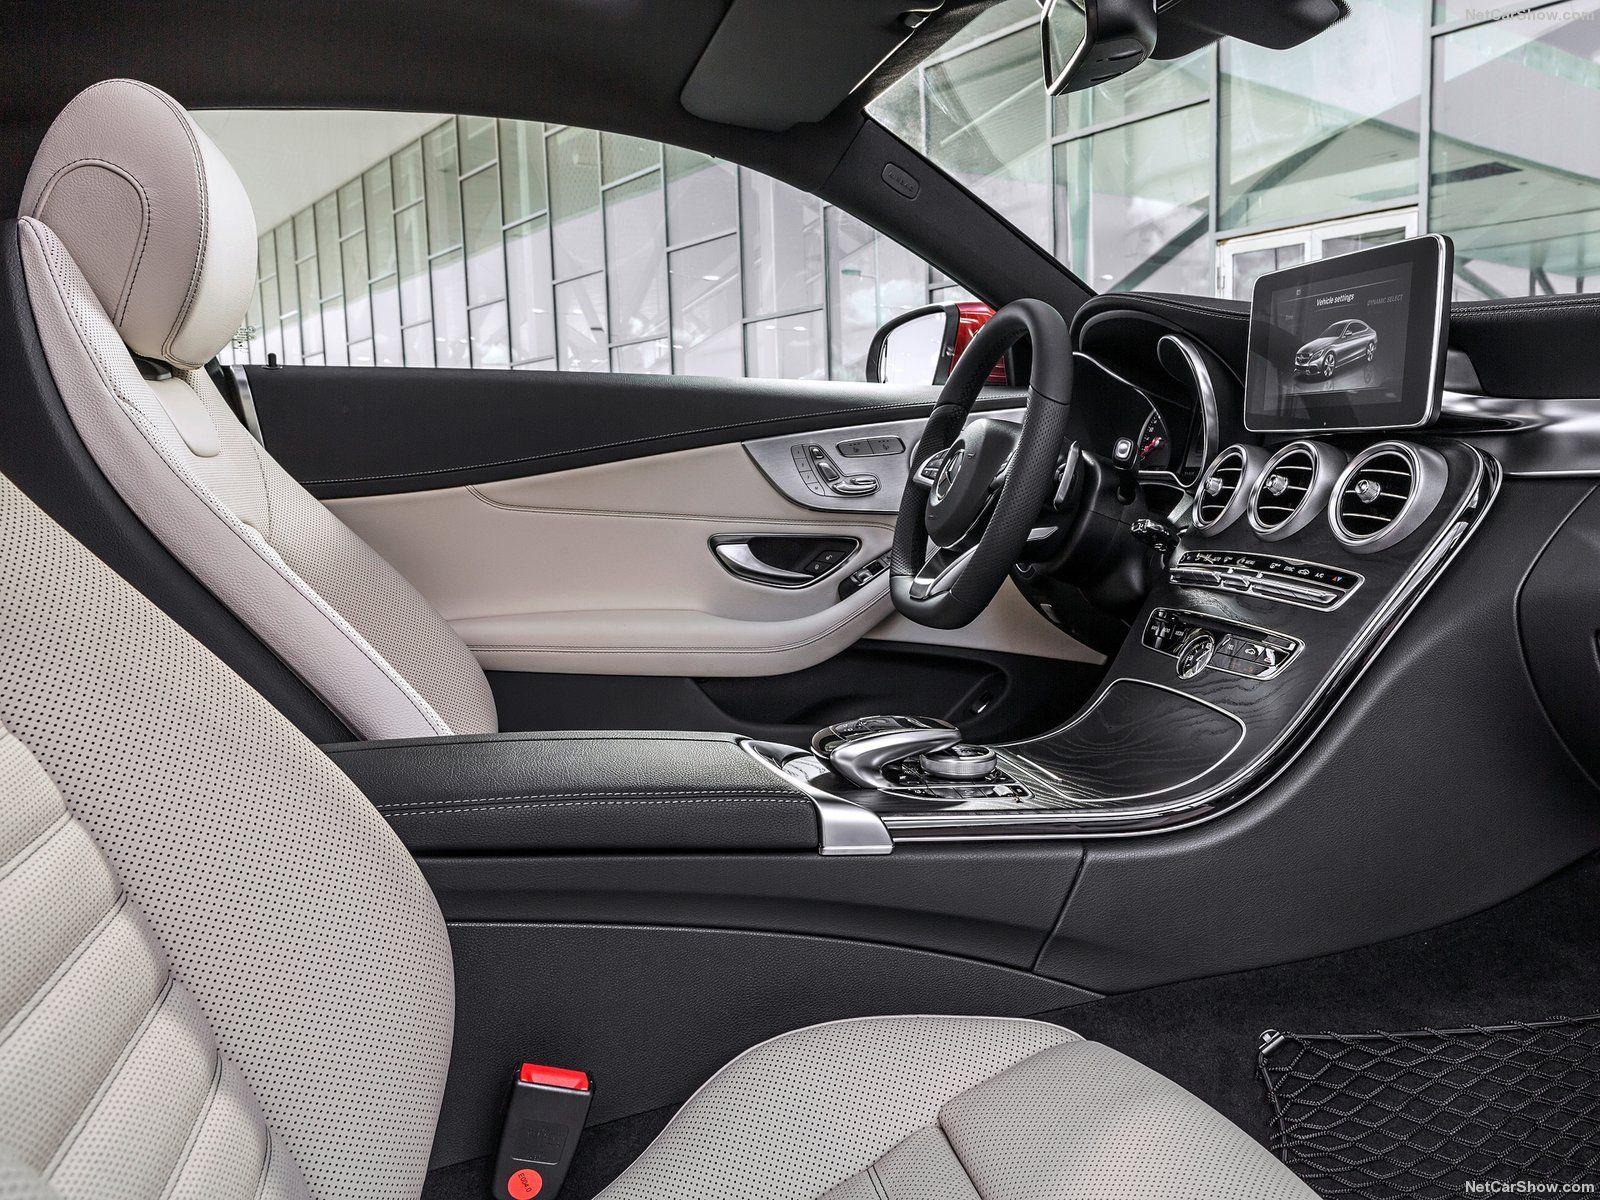 Mercedes Benz C Class Coupe 2017 (1600x1200)